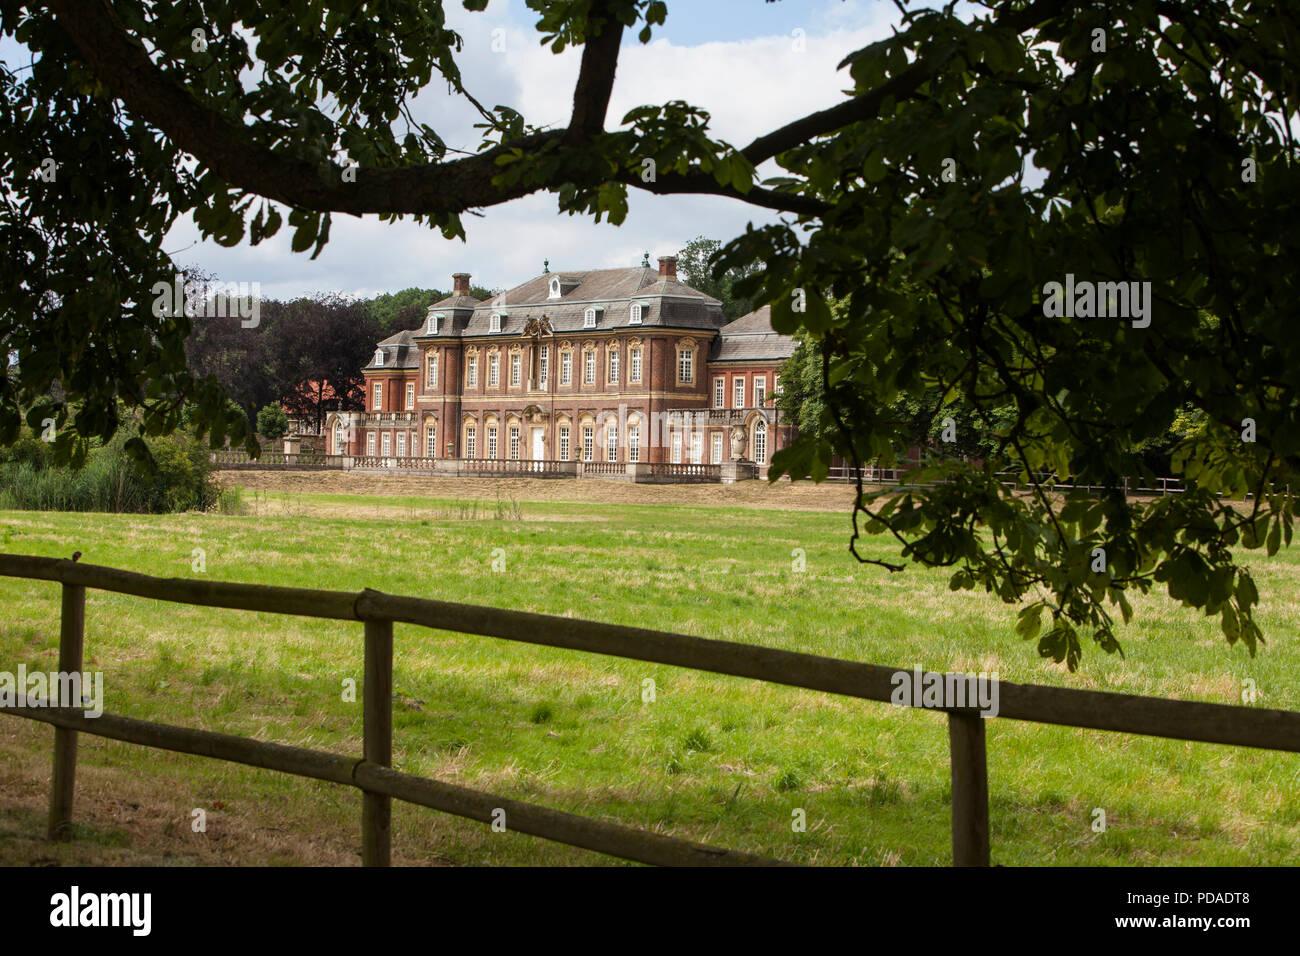 Oranienburg  Castle, Nordkirchen Moated Palace, Germany - Stock Image